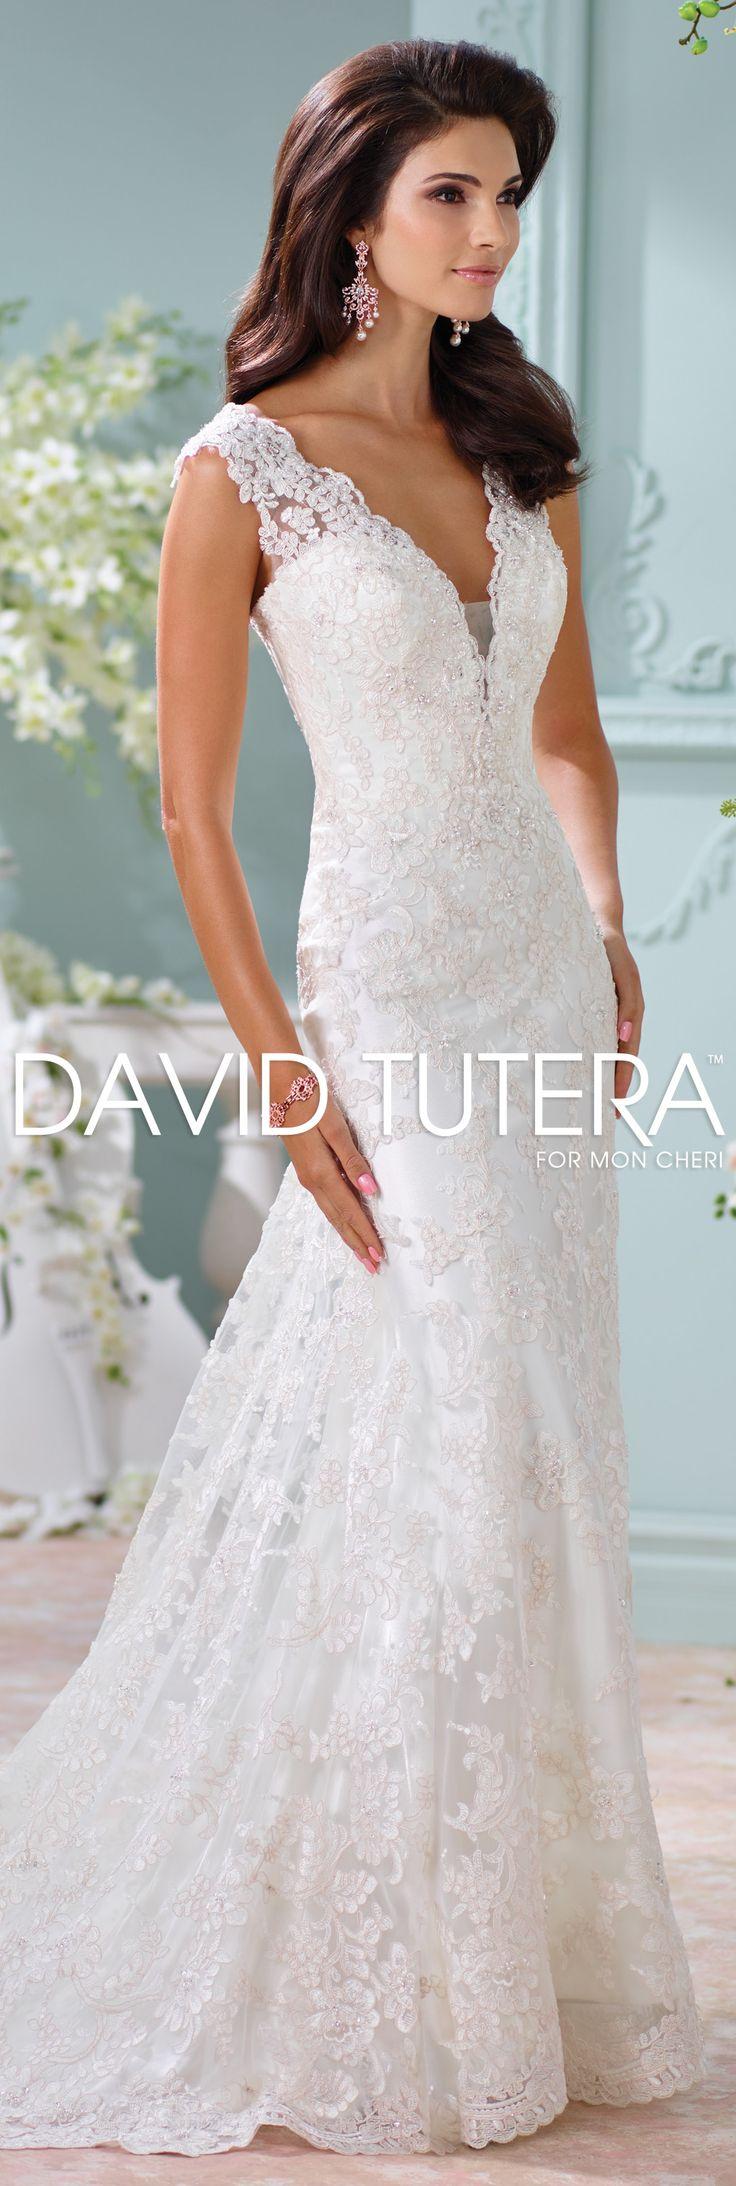 "The David Tutera for Mon Cheri Spring 2016 Wedding Gown Collection - ""Dayton""                                                                                                                                                                                 More"